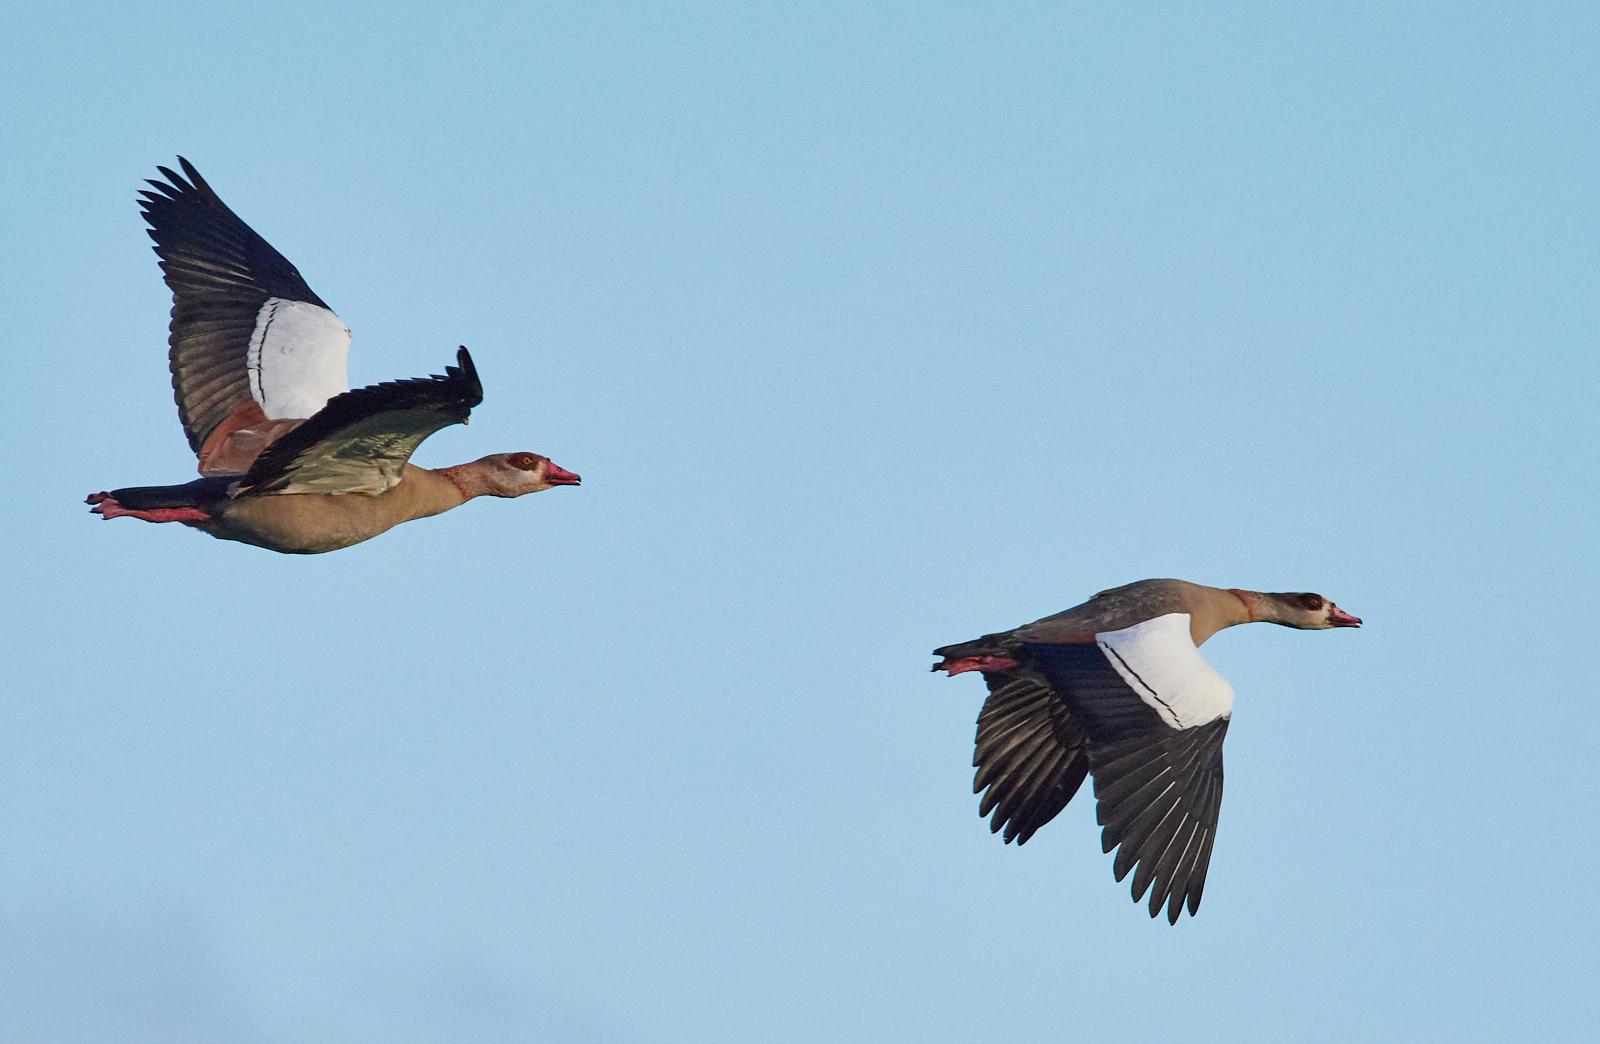 Egyptian geese1600x1200 sRGB.jpg